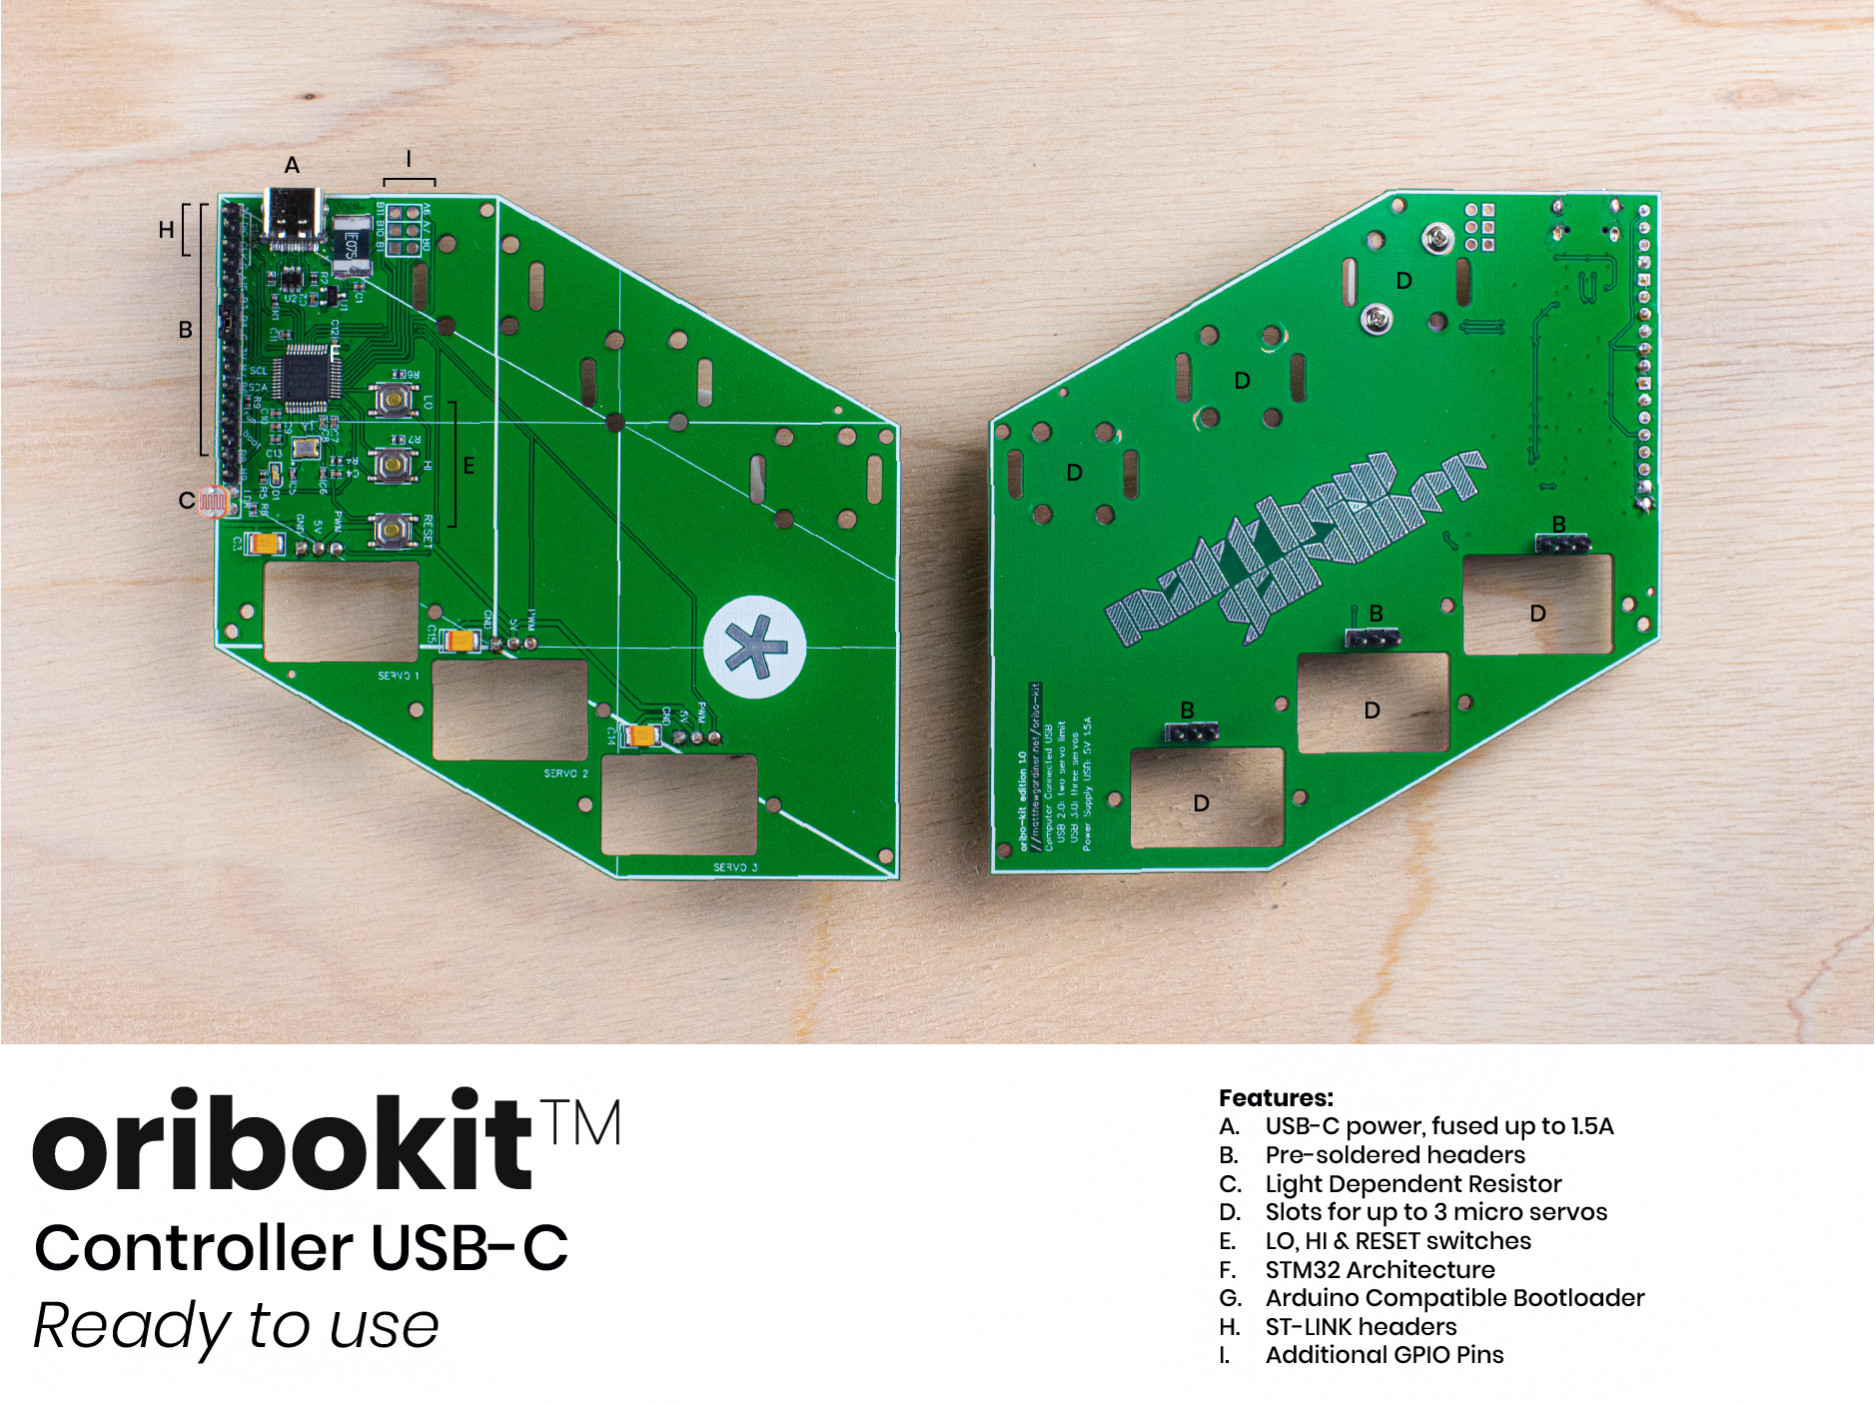 Oribokit Controller